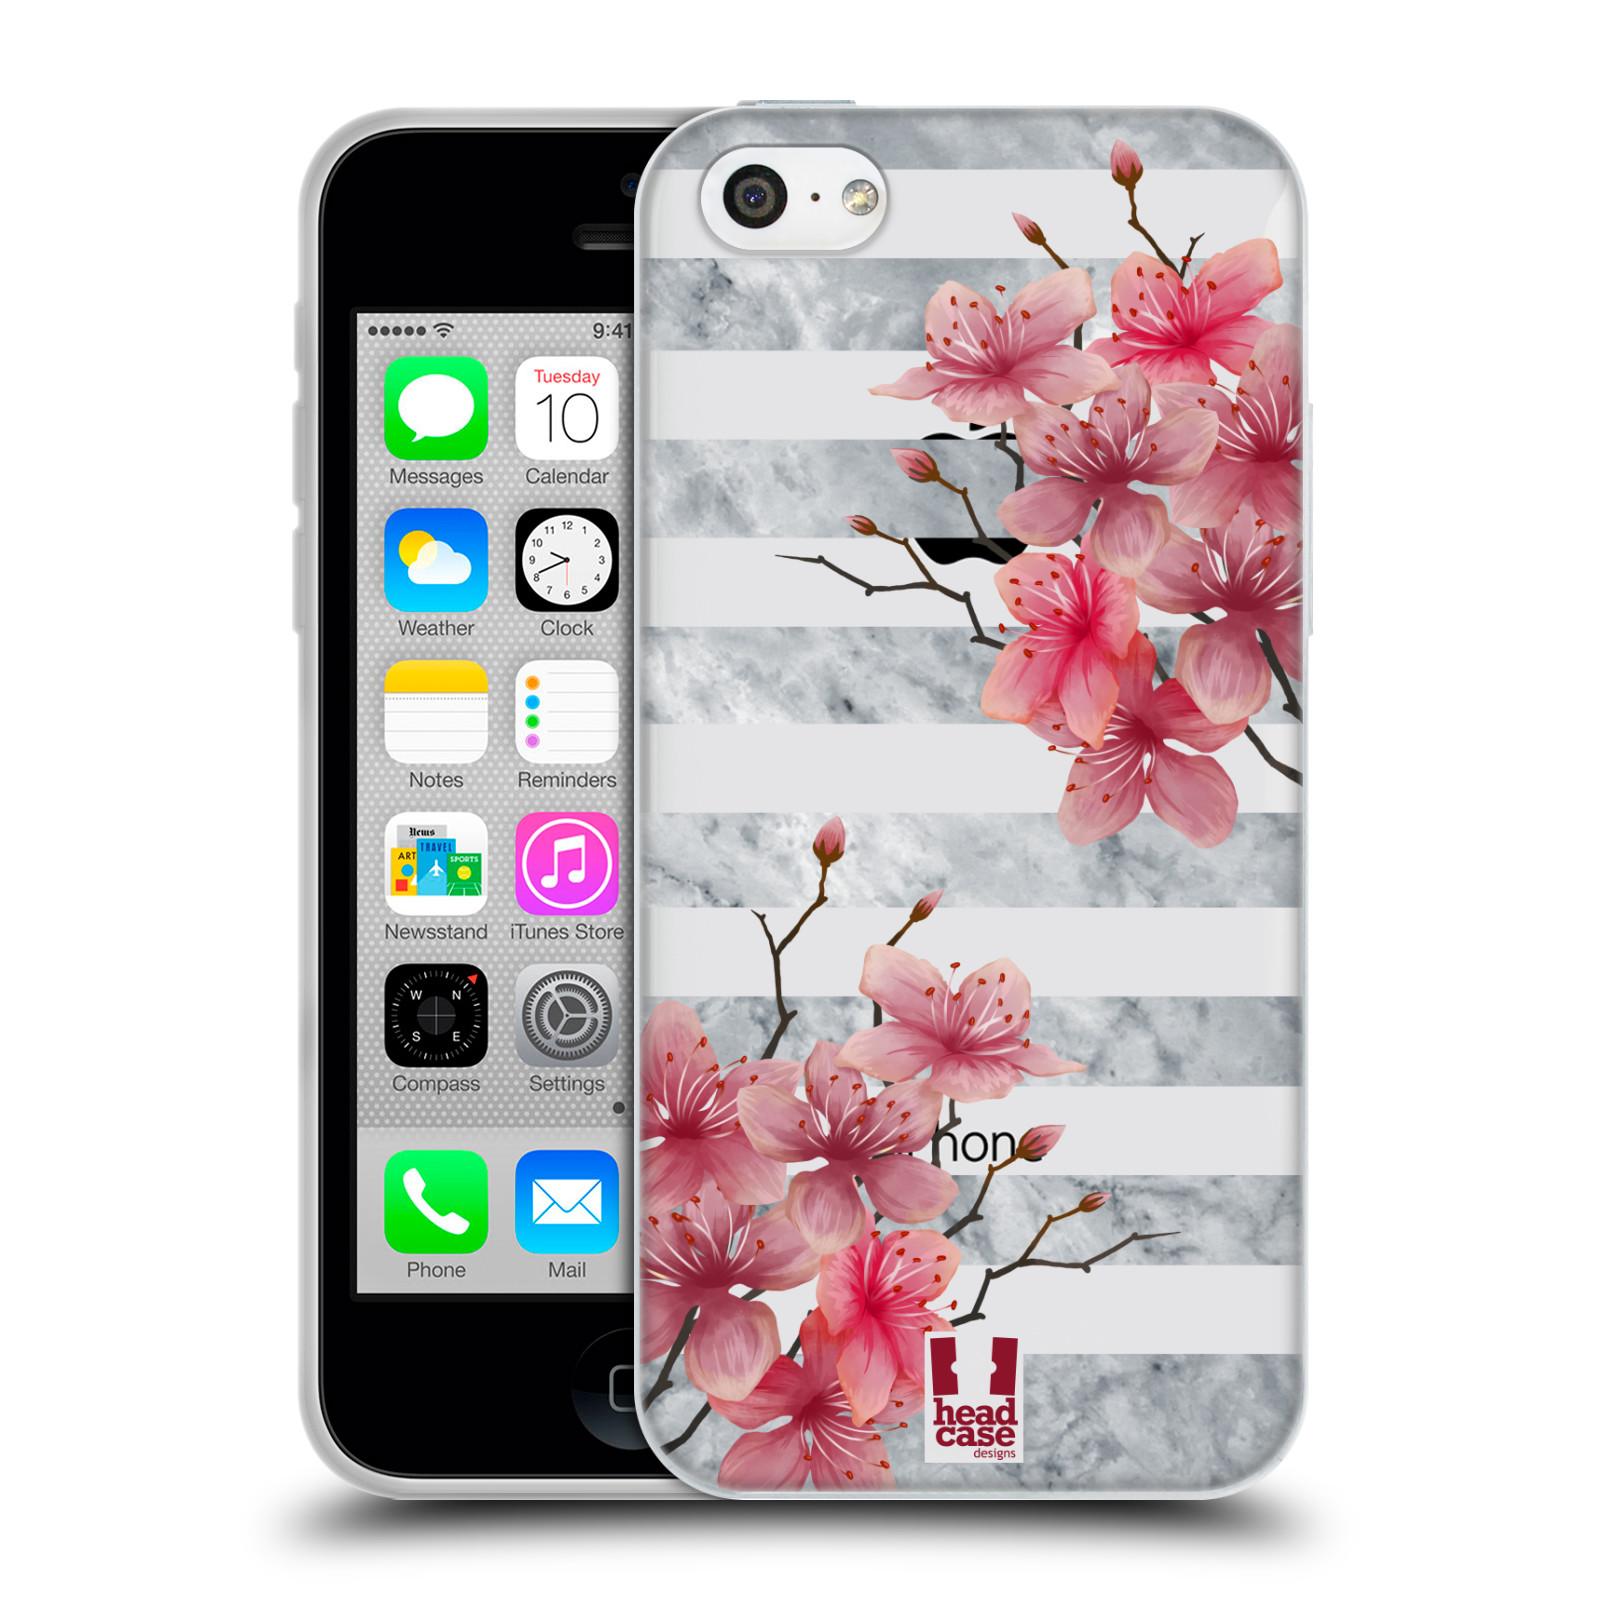 Silikonové pouzdro na mobil Apple iPhone 5C - Head Case - Kvítka a mramor